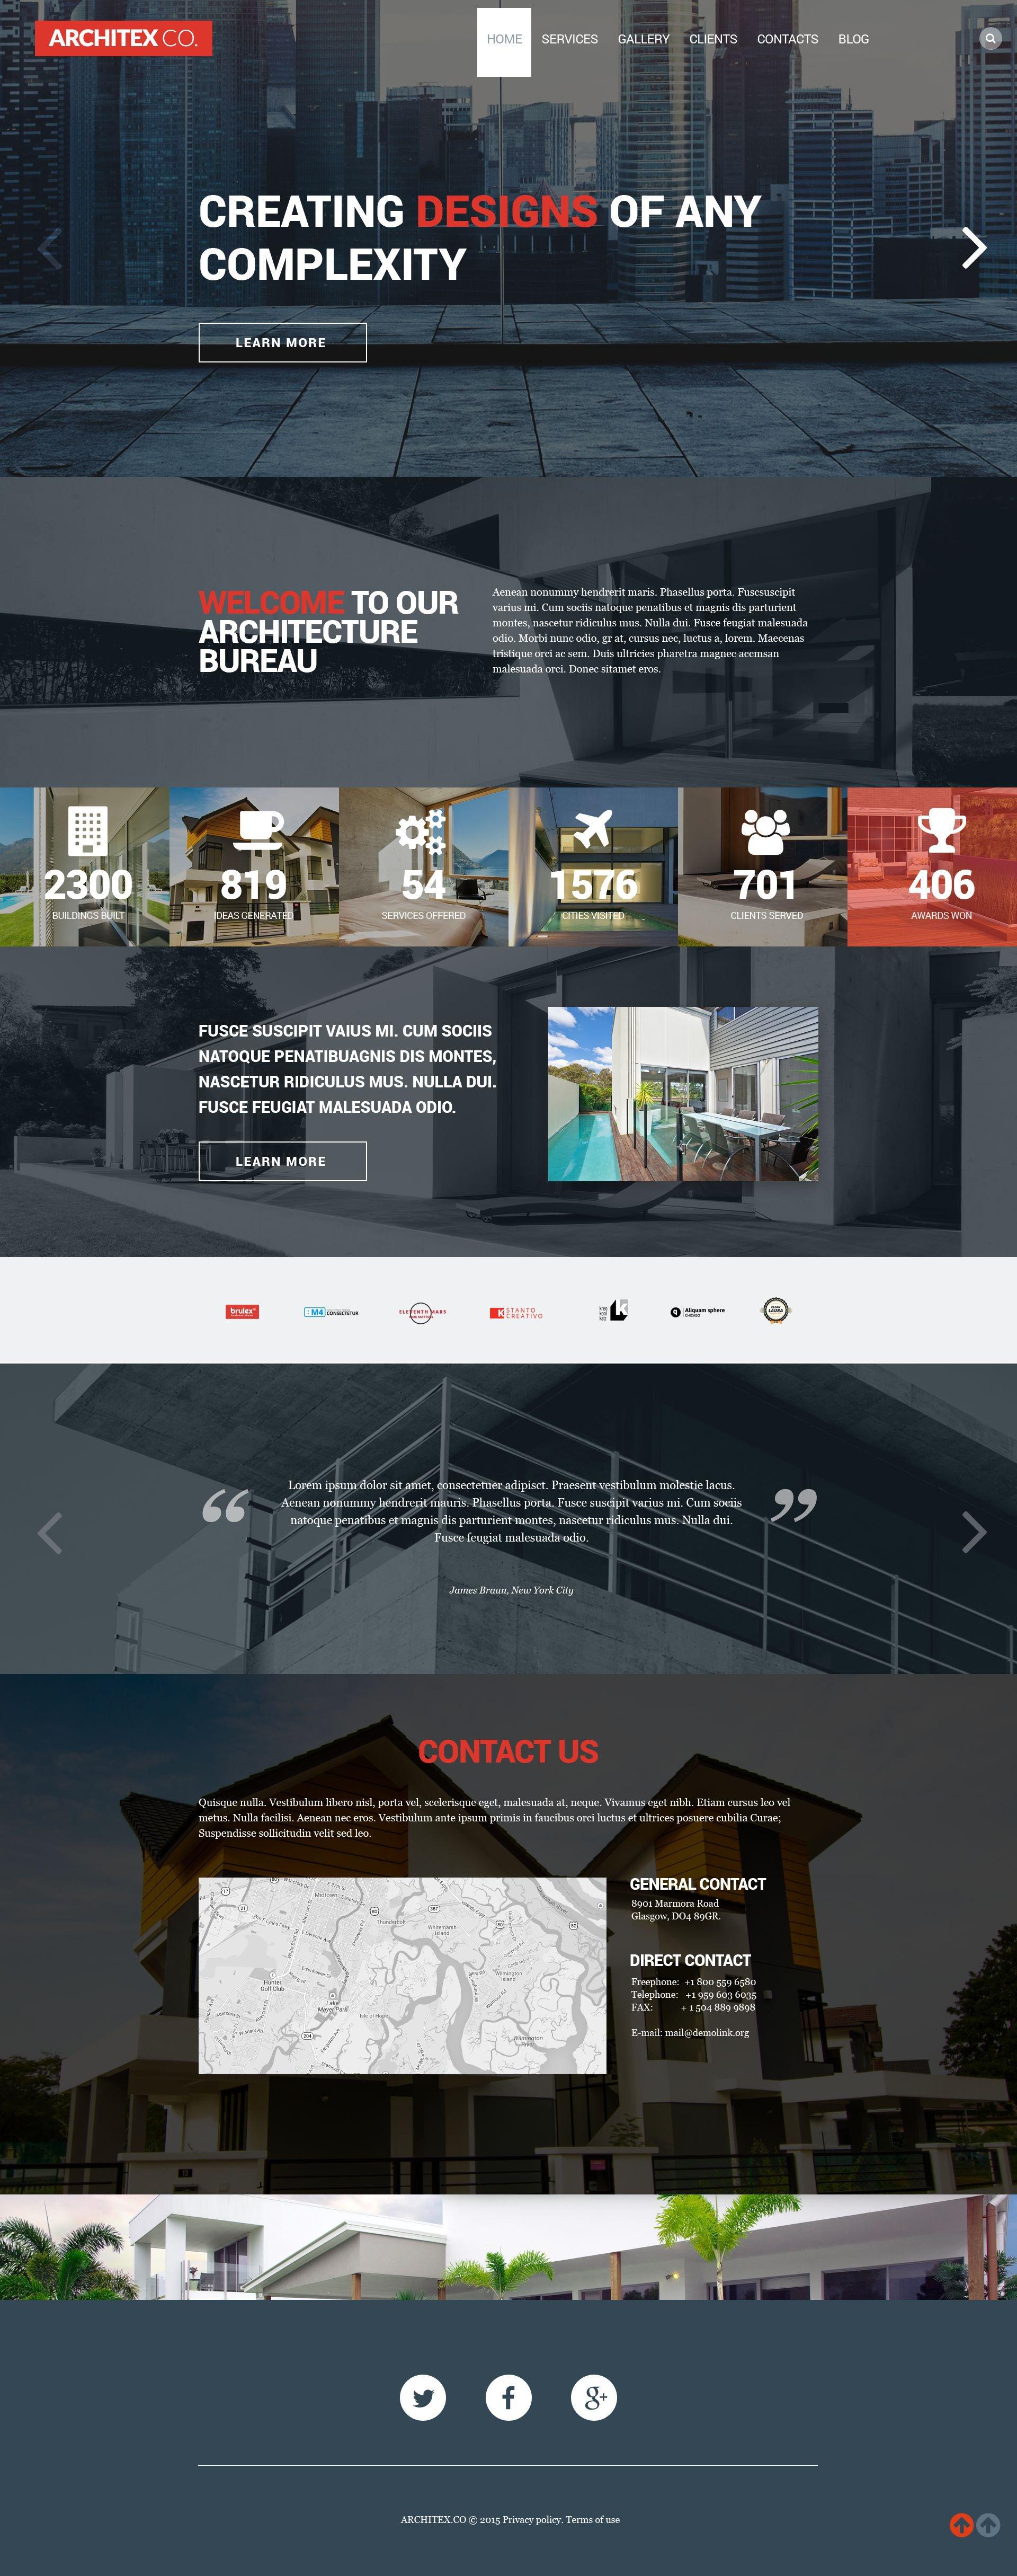 """Architecture"" 响应式WordPress模板 #53384 - 截图"